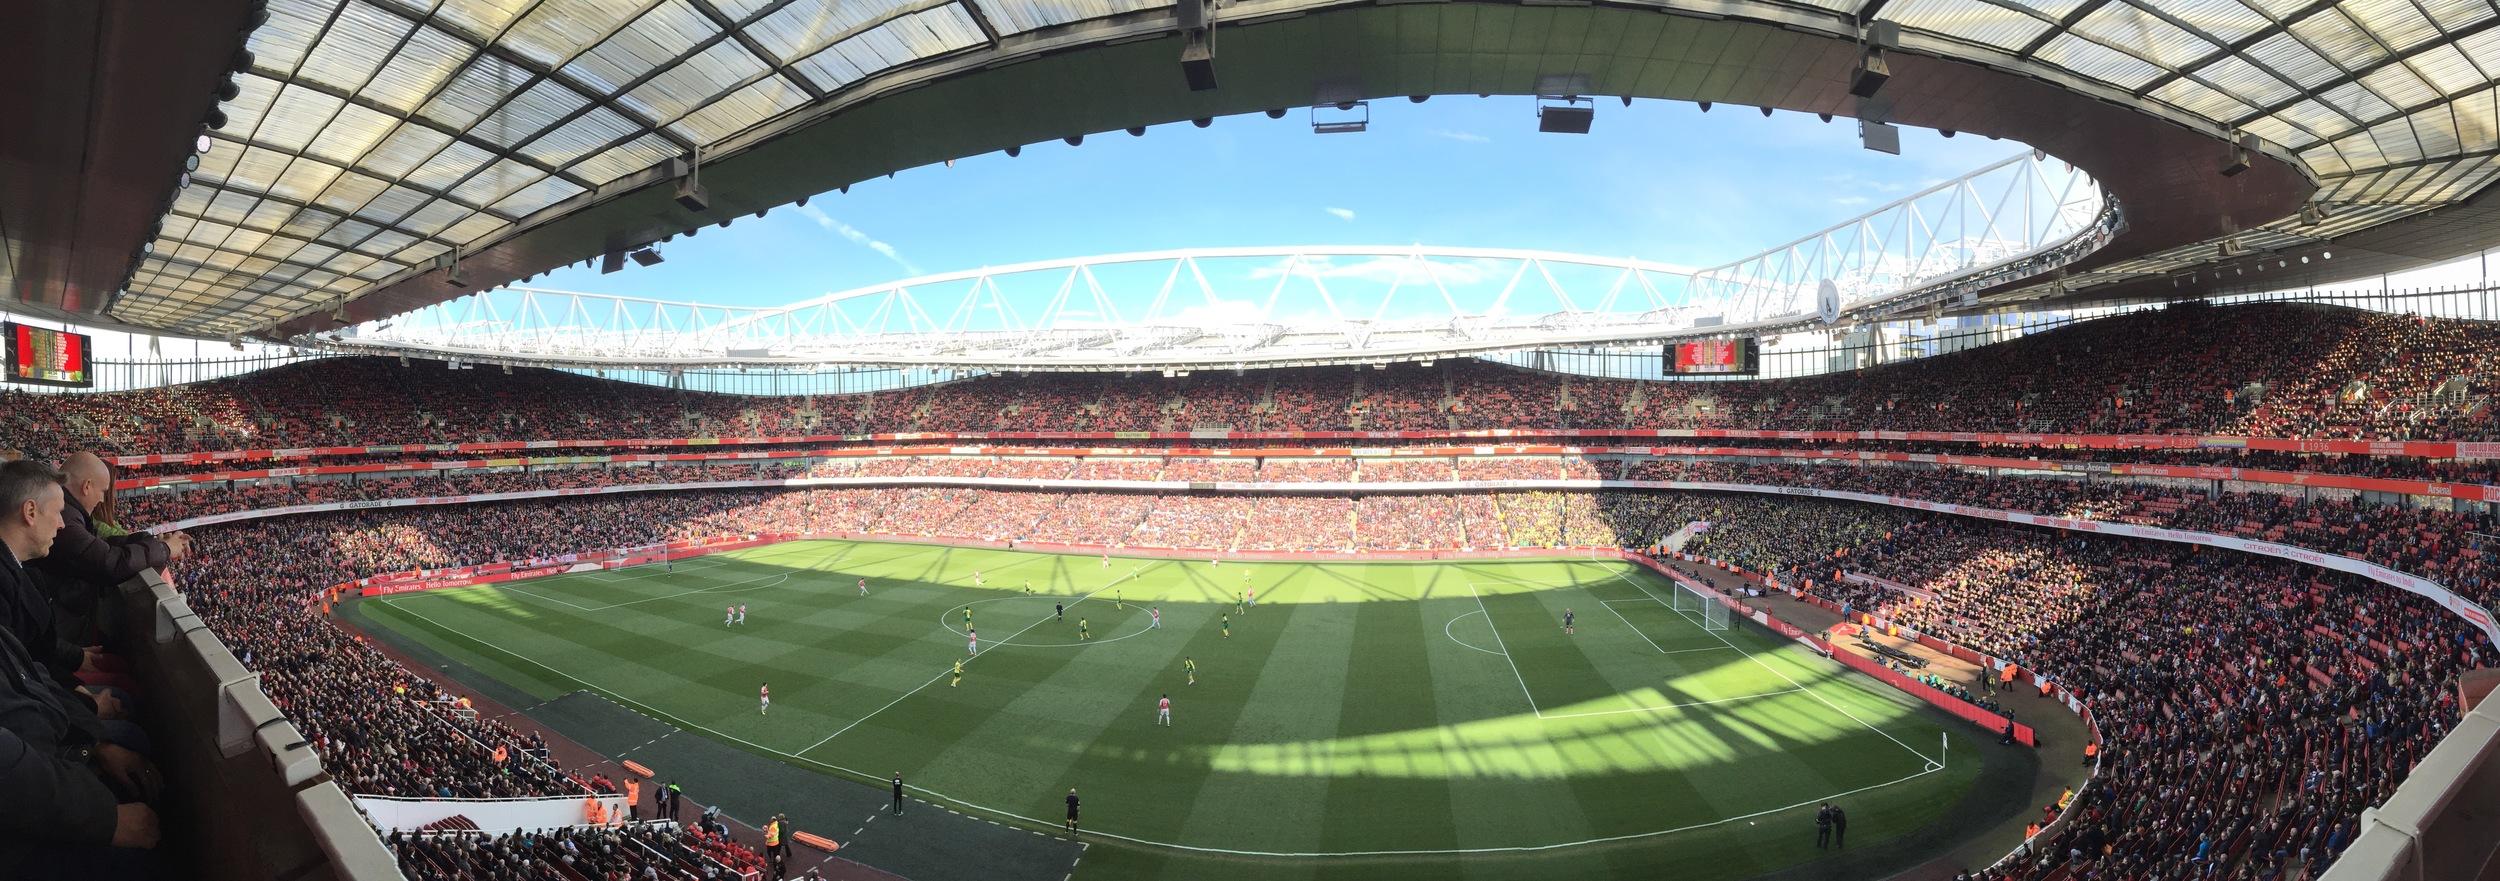 Emirates Stadium watching Arsenal Football in London, England.